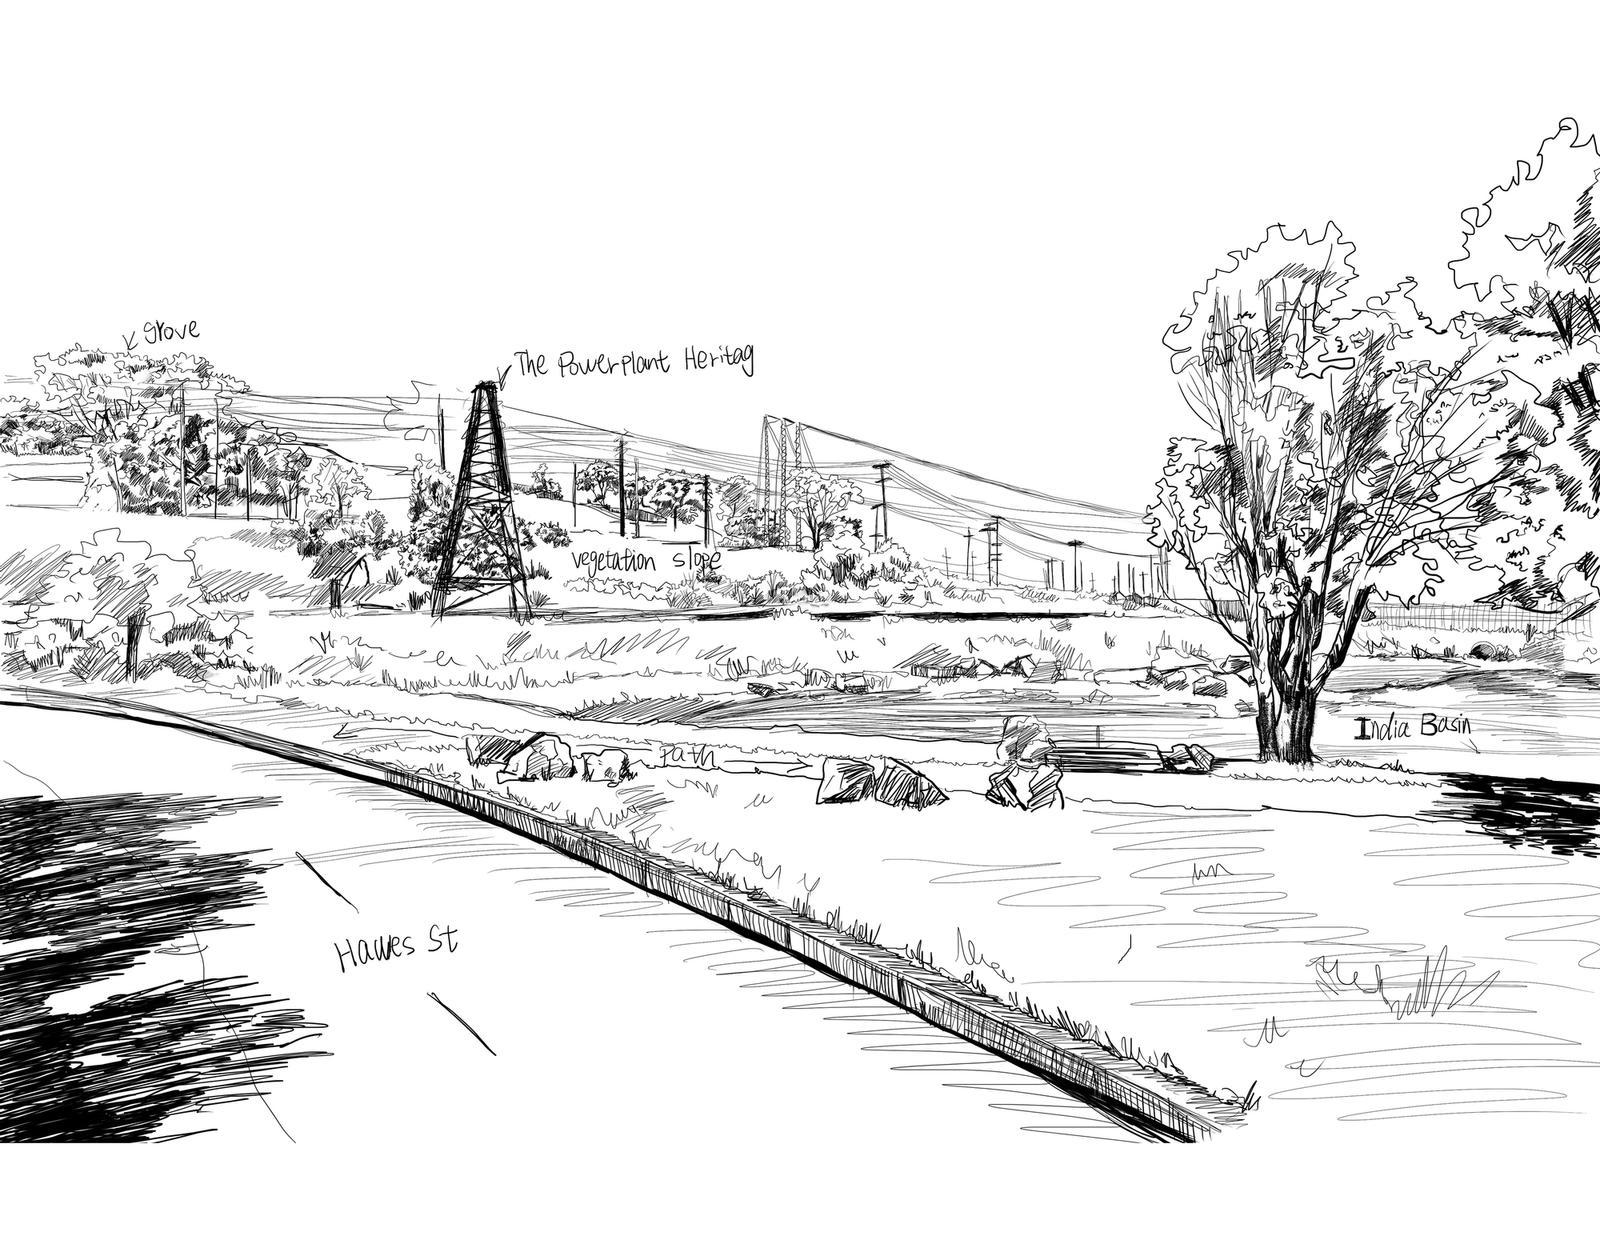 Site Analysis Sketch 2 – India Basin Park, San Francisco